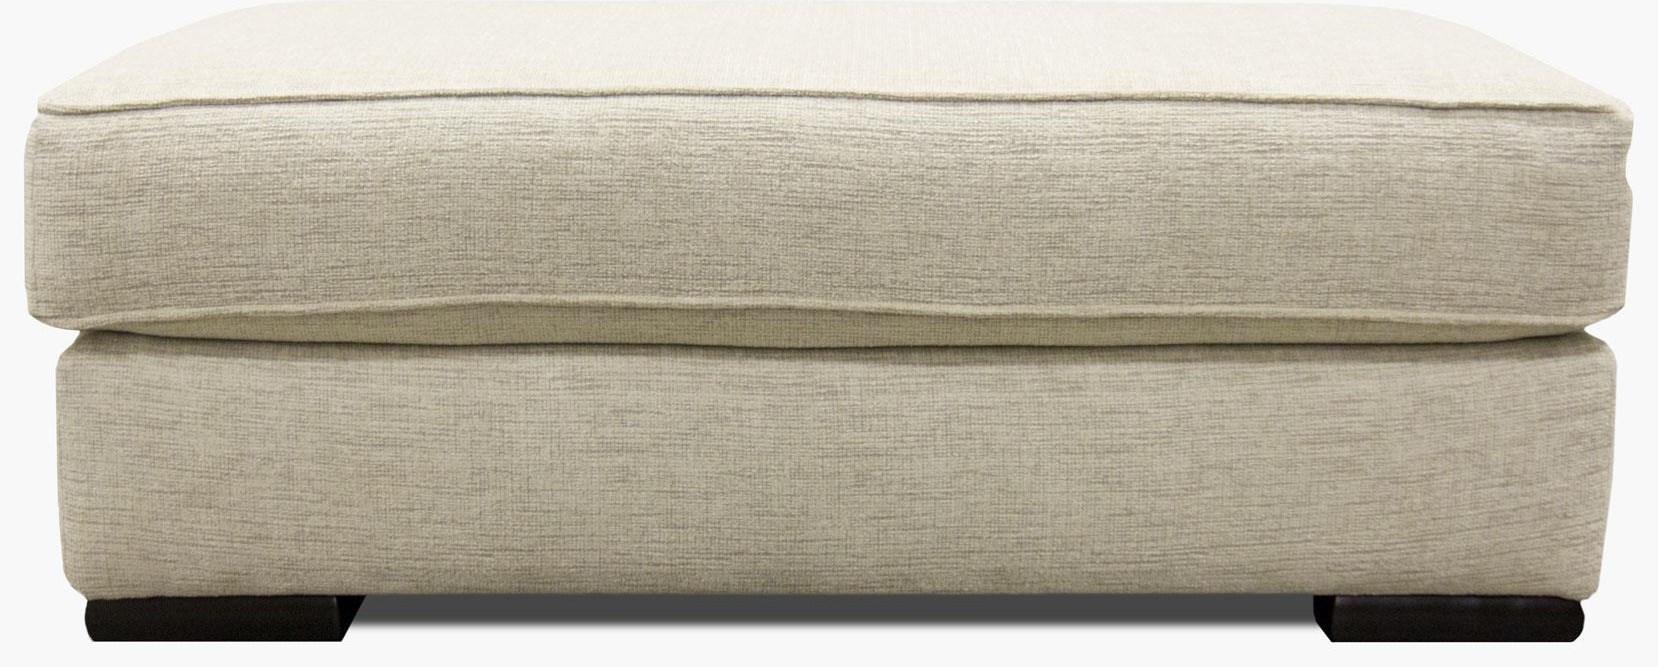 Fusion Furniture Bradley-Cream Ottoman - Item Number: 2013-BRADLEY-CREAM